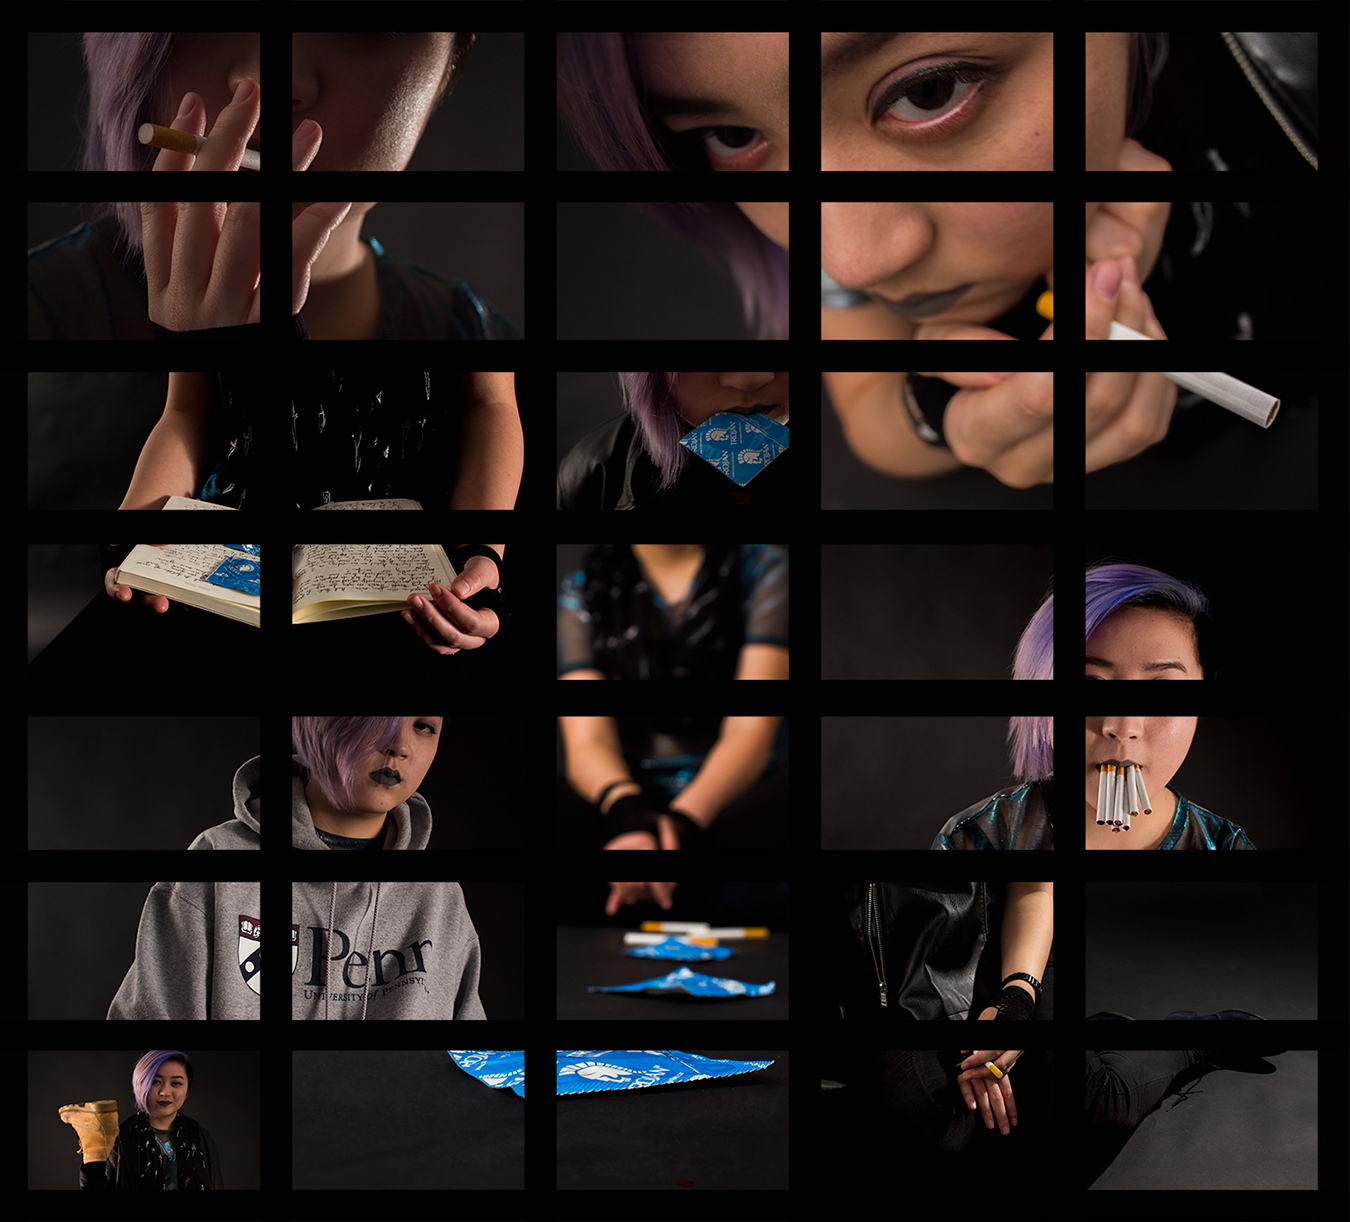 Tony_Ward_Studio_photography_Grant_Wei_Sex_Cigarettes_esistence_poetry